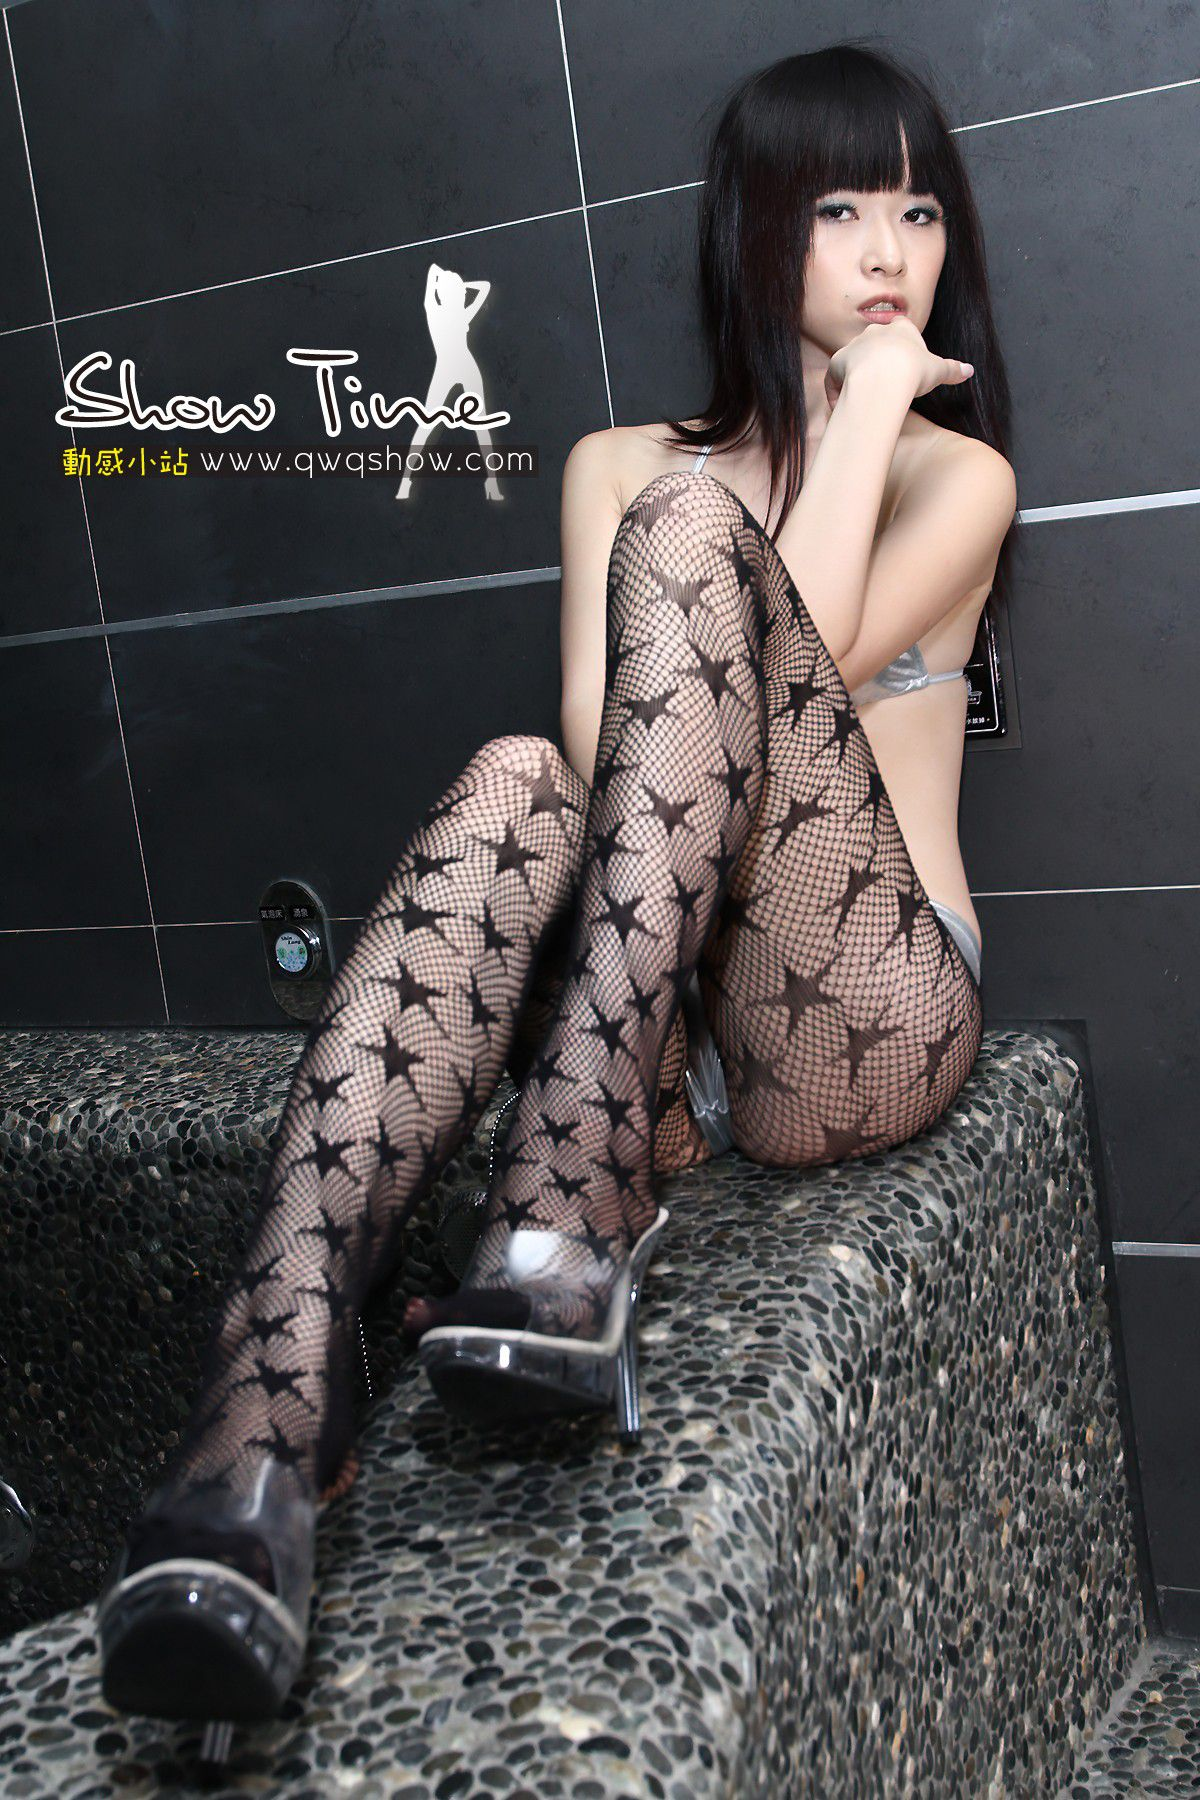 VOL.381 [动感之星]泳装网袜:动感小站娜娜(动感之星娜娜)高品质写真套图(42P)